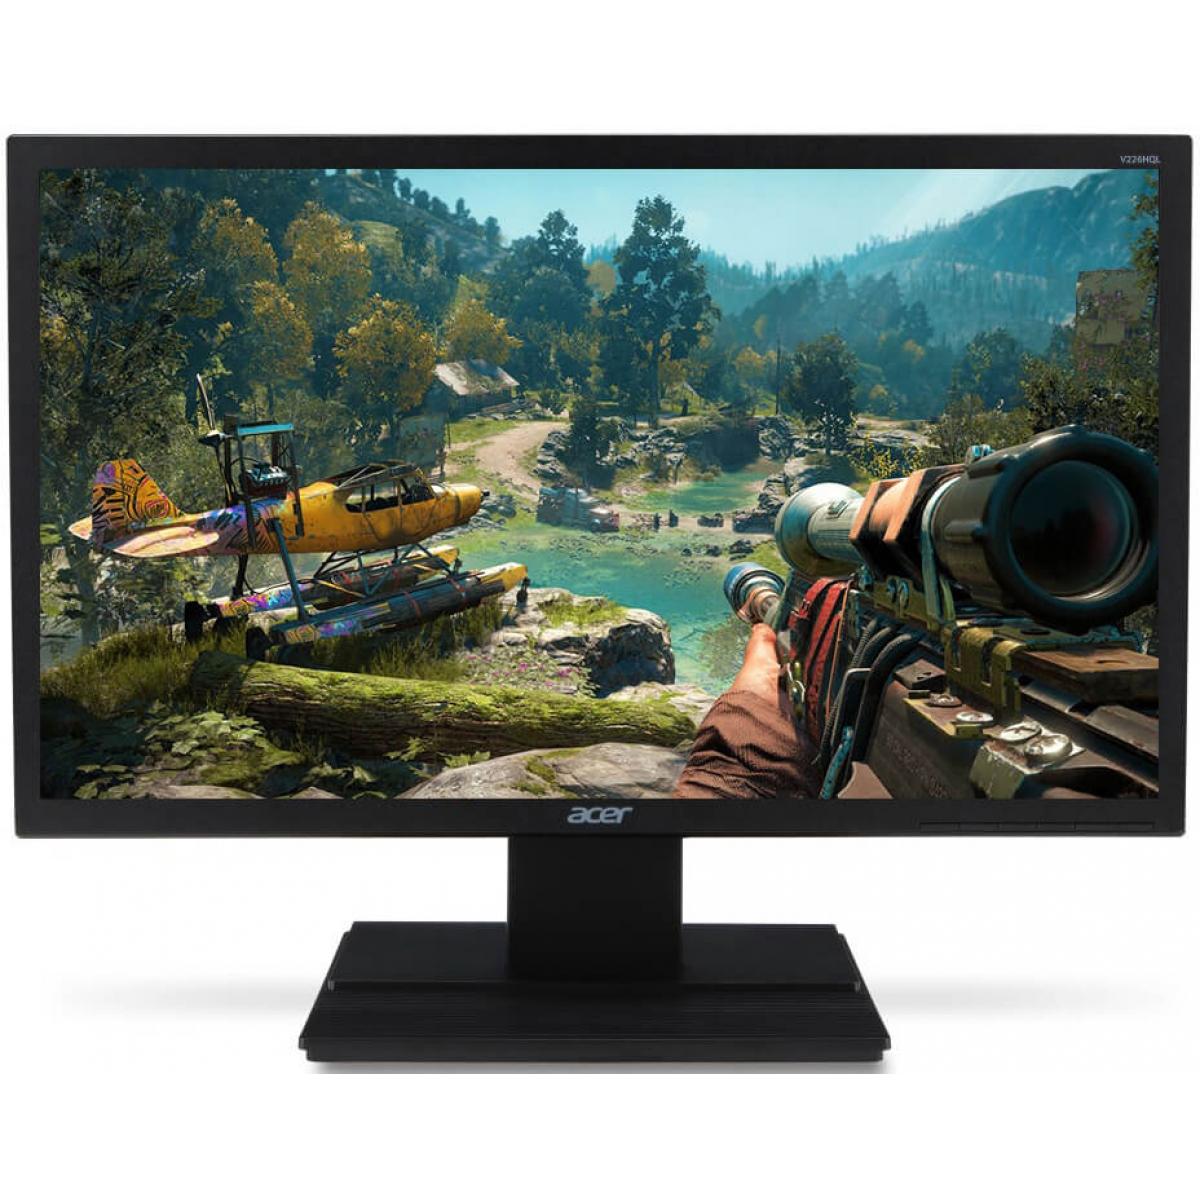 Monitor Gamer Acer 19.5 Pol, HD, 60Hz, 5ms, V206HQLHDMI